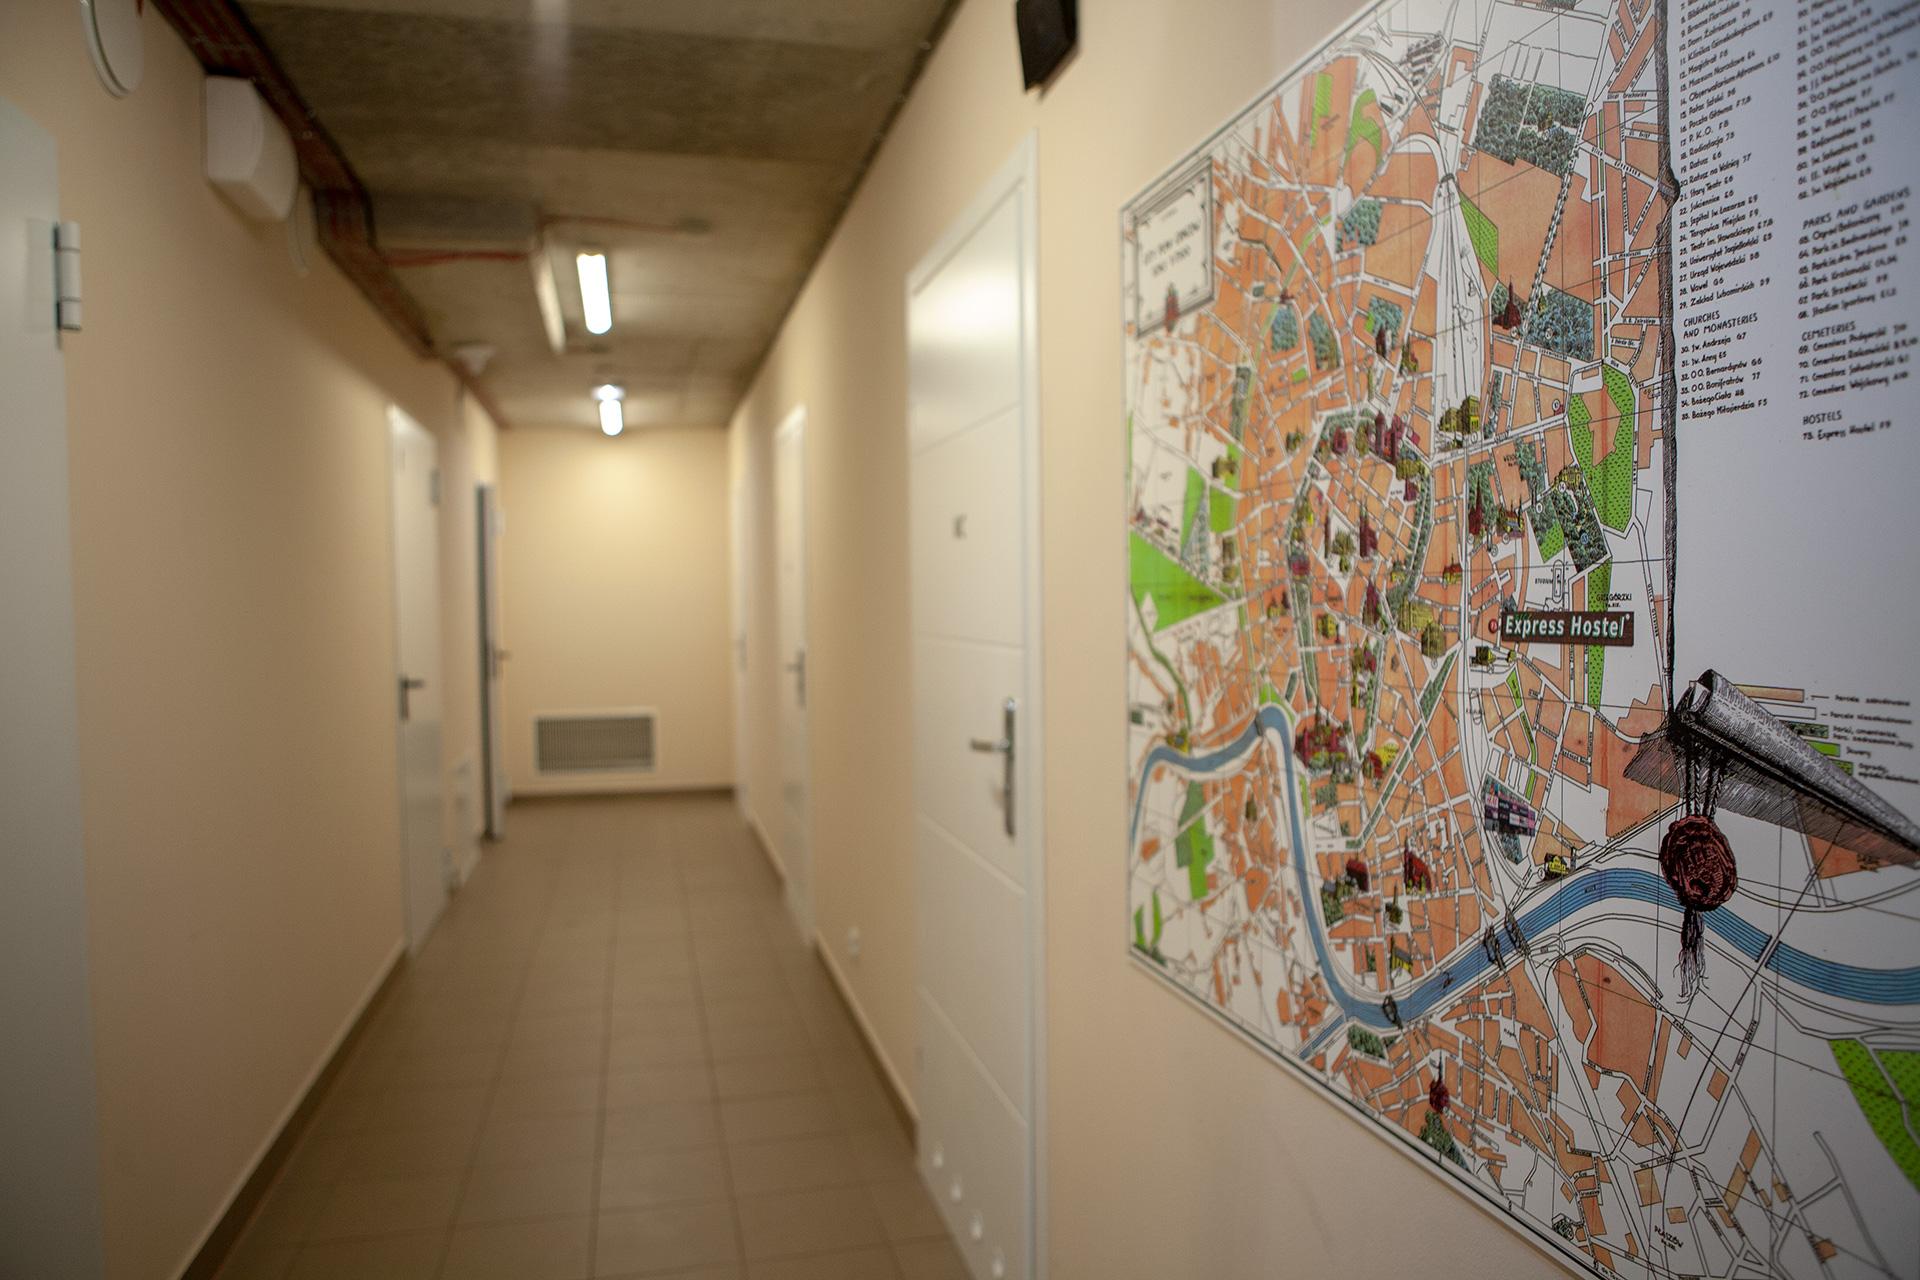 HOSTEL - Express Hostel